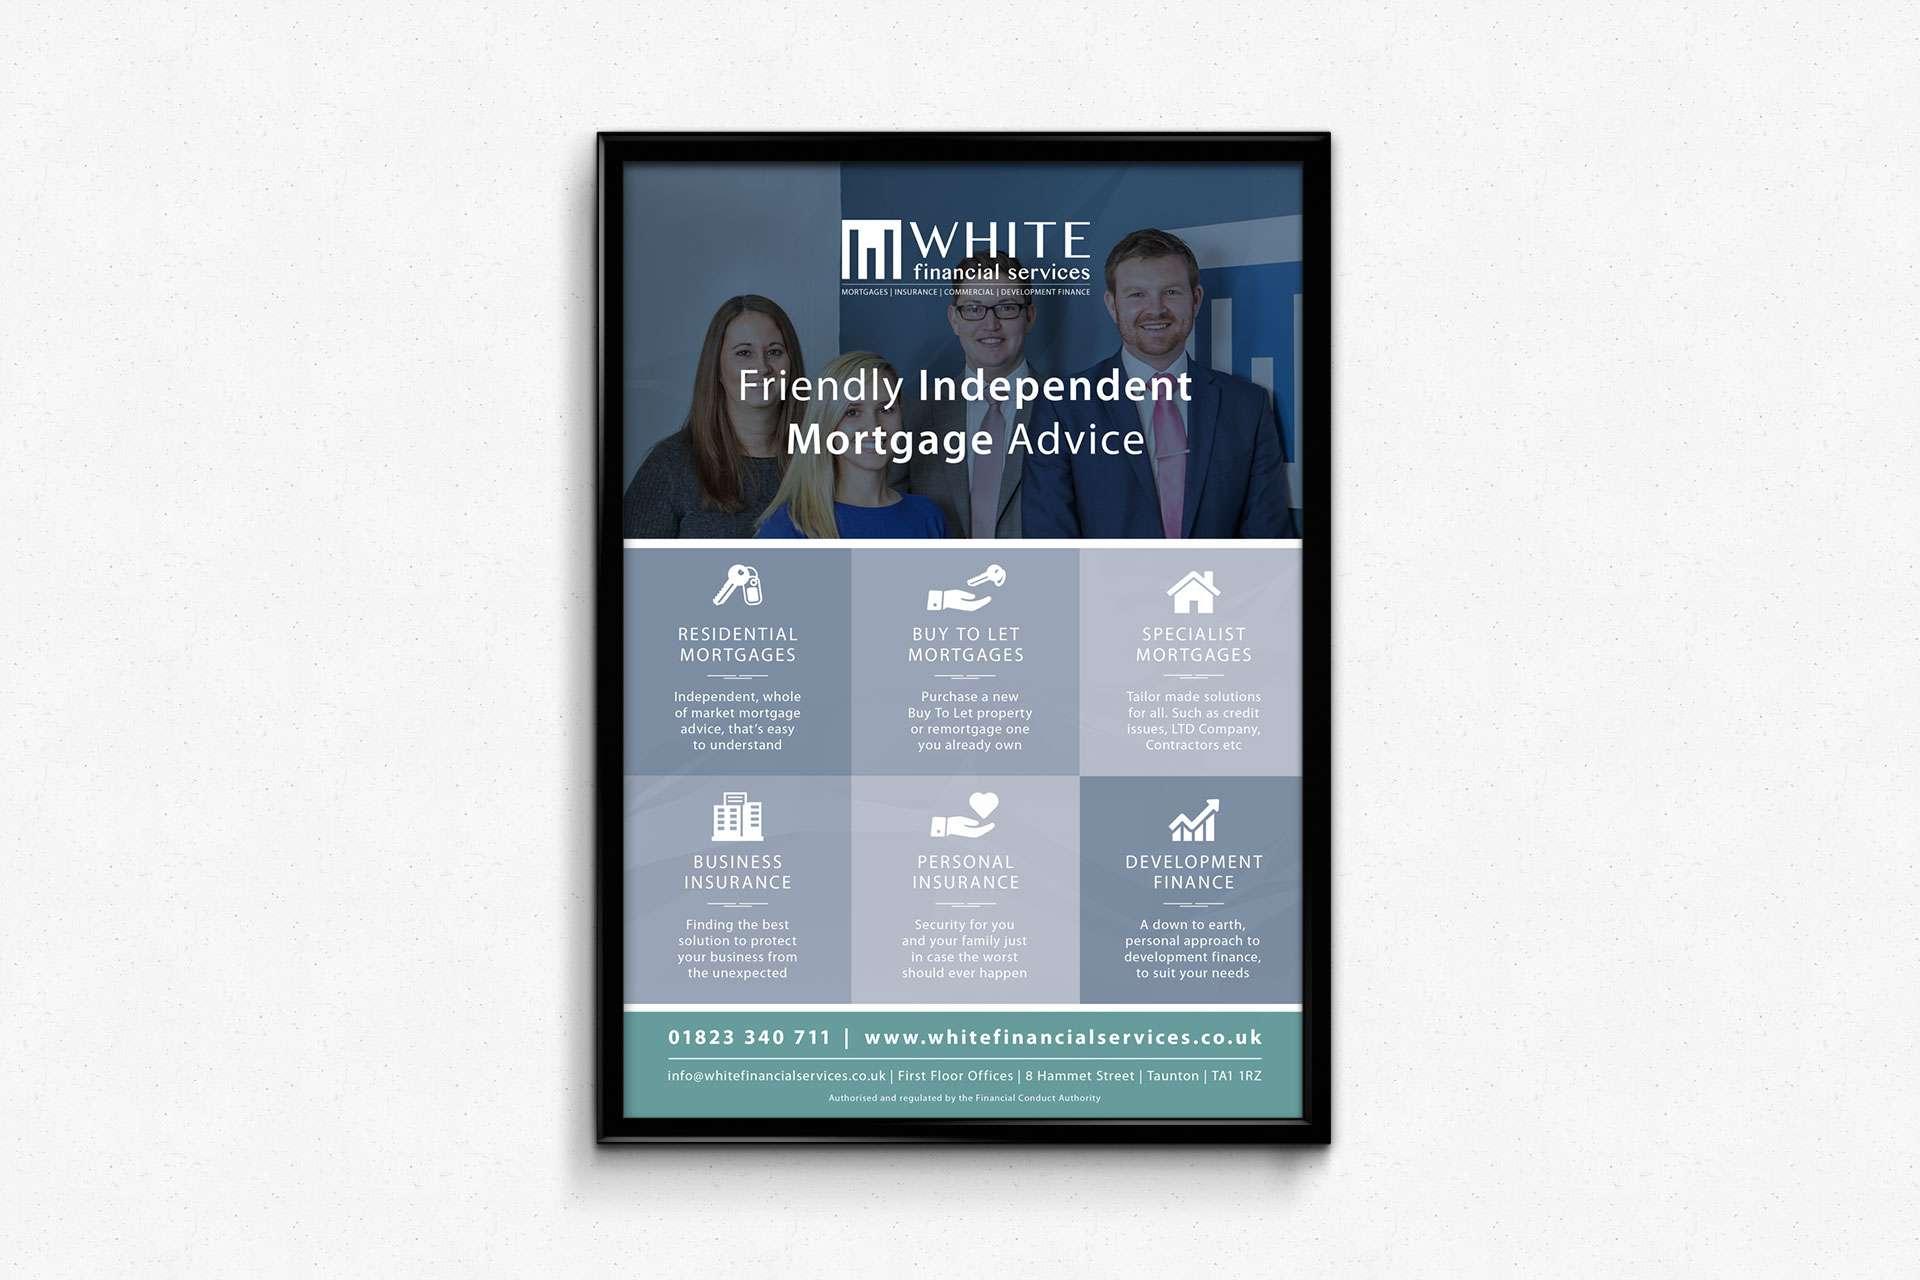 White Financial Business Services Poster Design Taunton Somerset